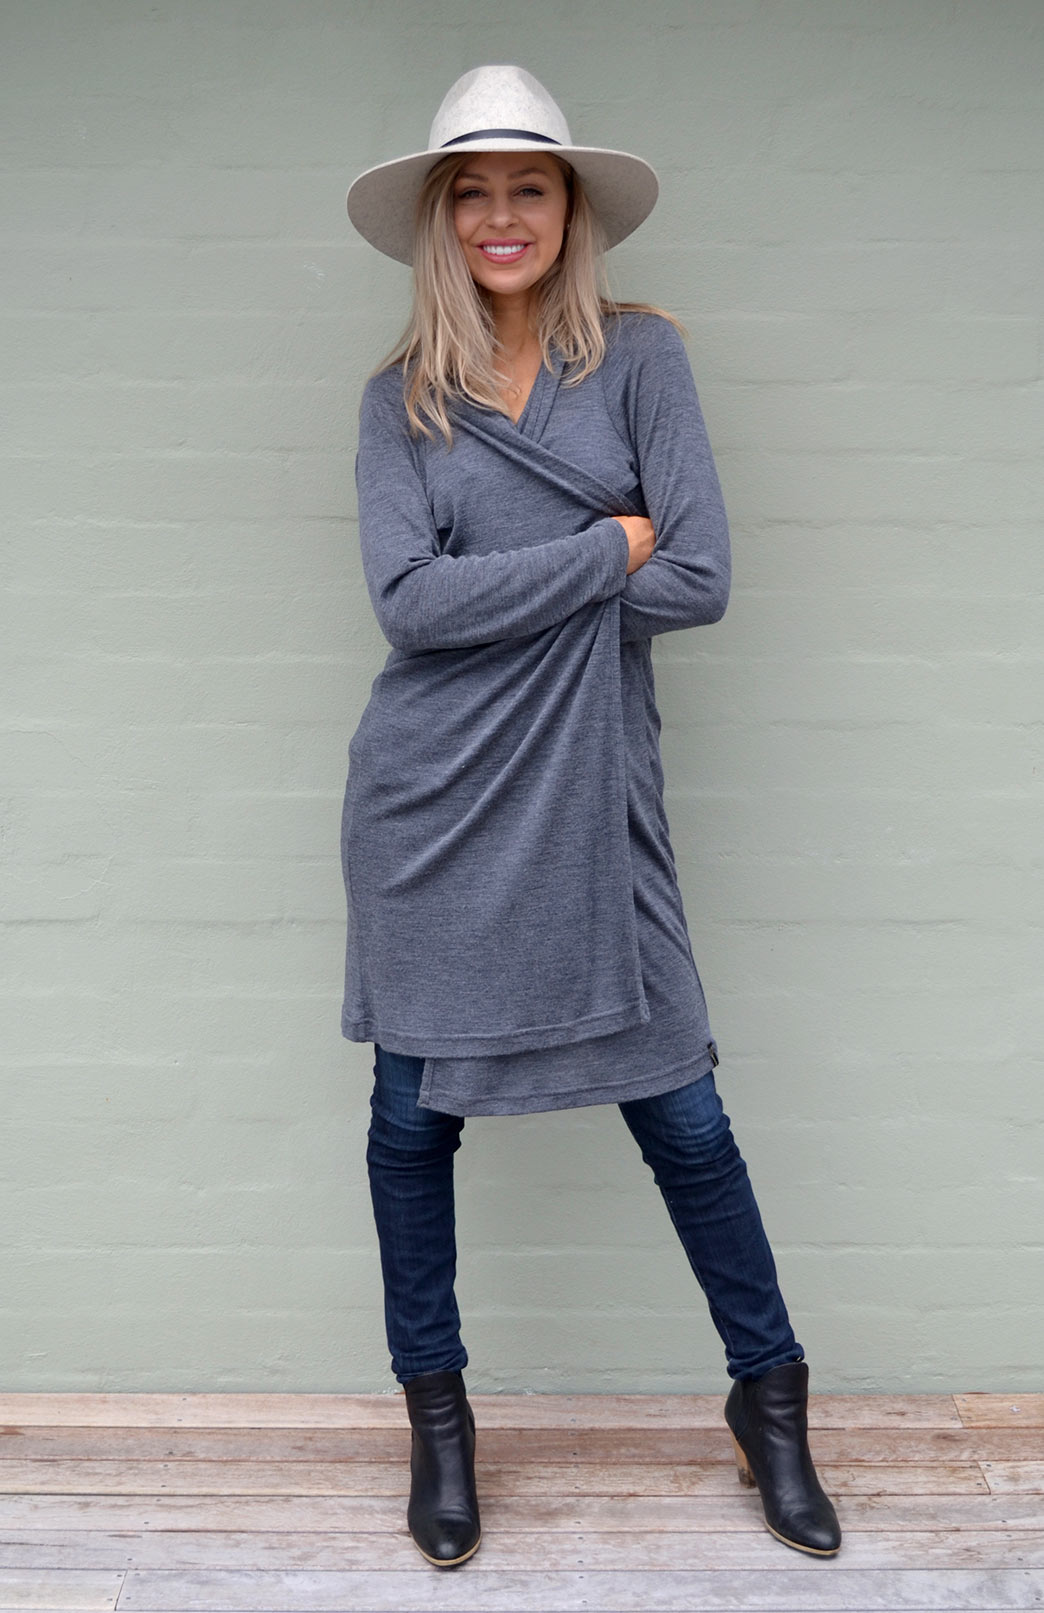 Long Drape Cardigan - Lightweight - Women's Knee Length Grey Marl Merino Wool Waterfall Cardigan - Smitten Merino Tasmania Australia